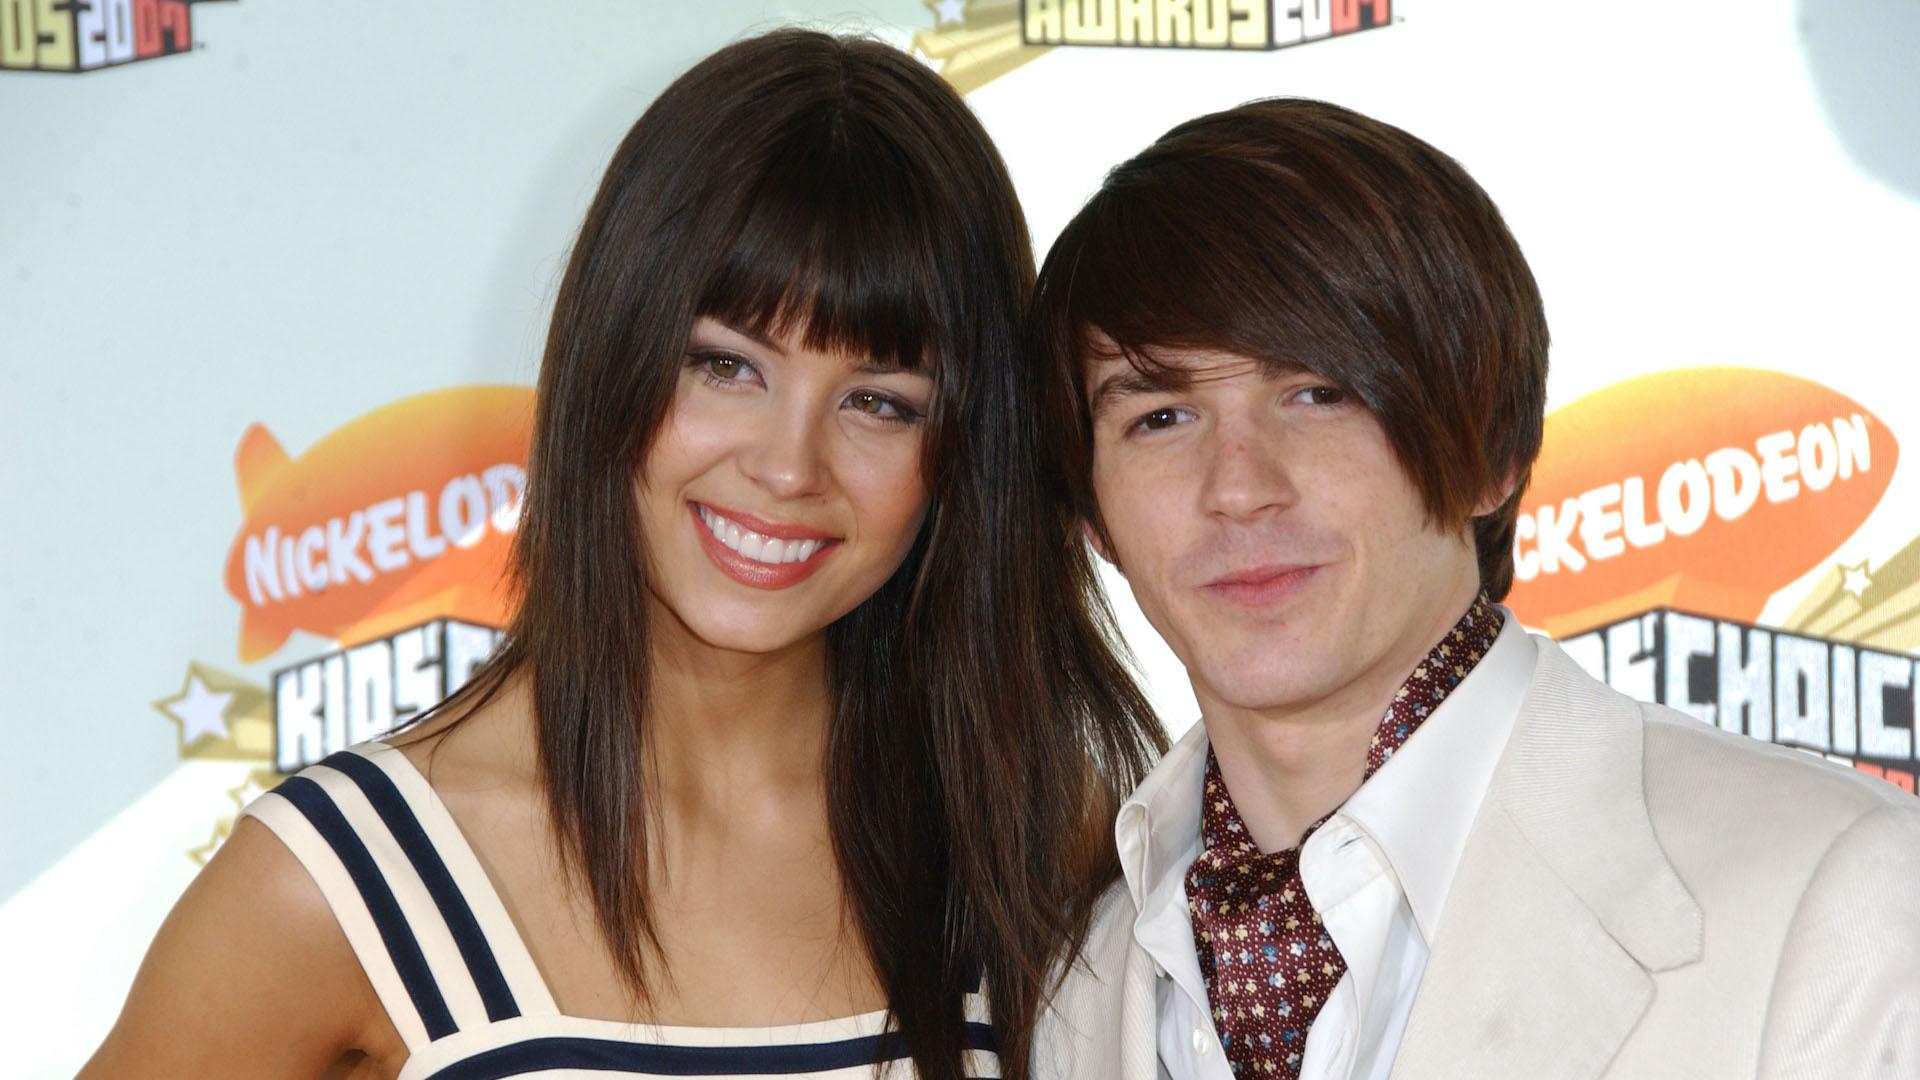 Nickelodeon Star Drake Bell Denies Ex-Girlfriend's Abuse Allegations